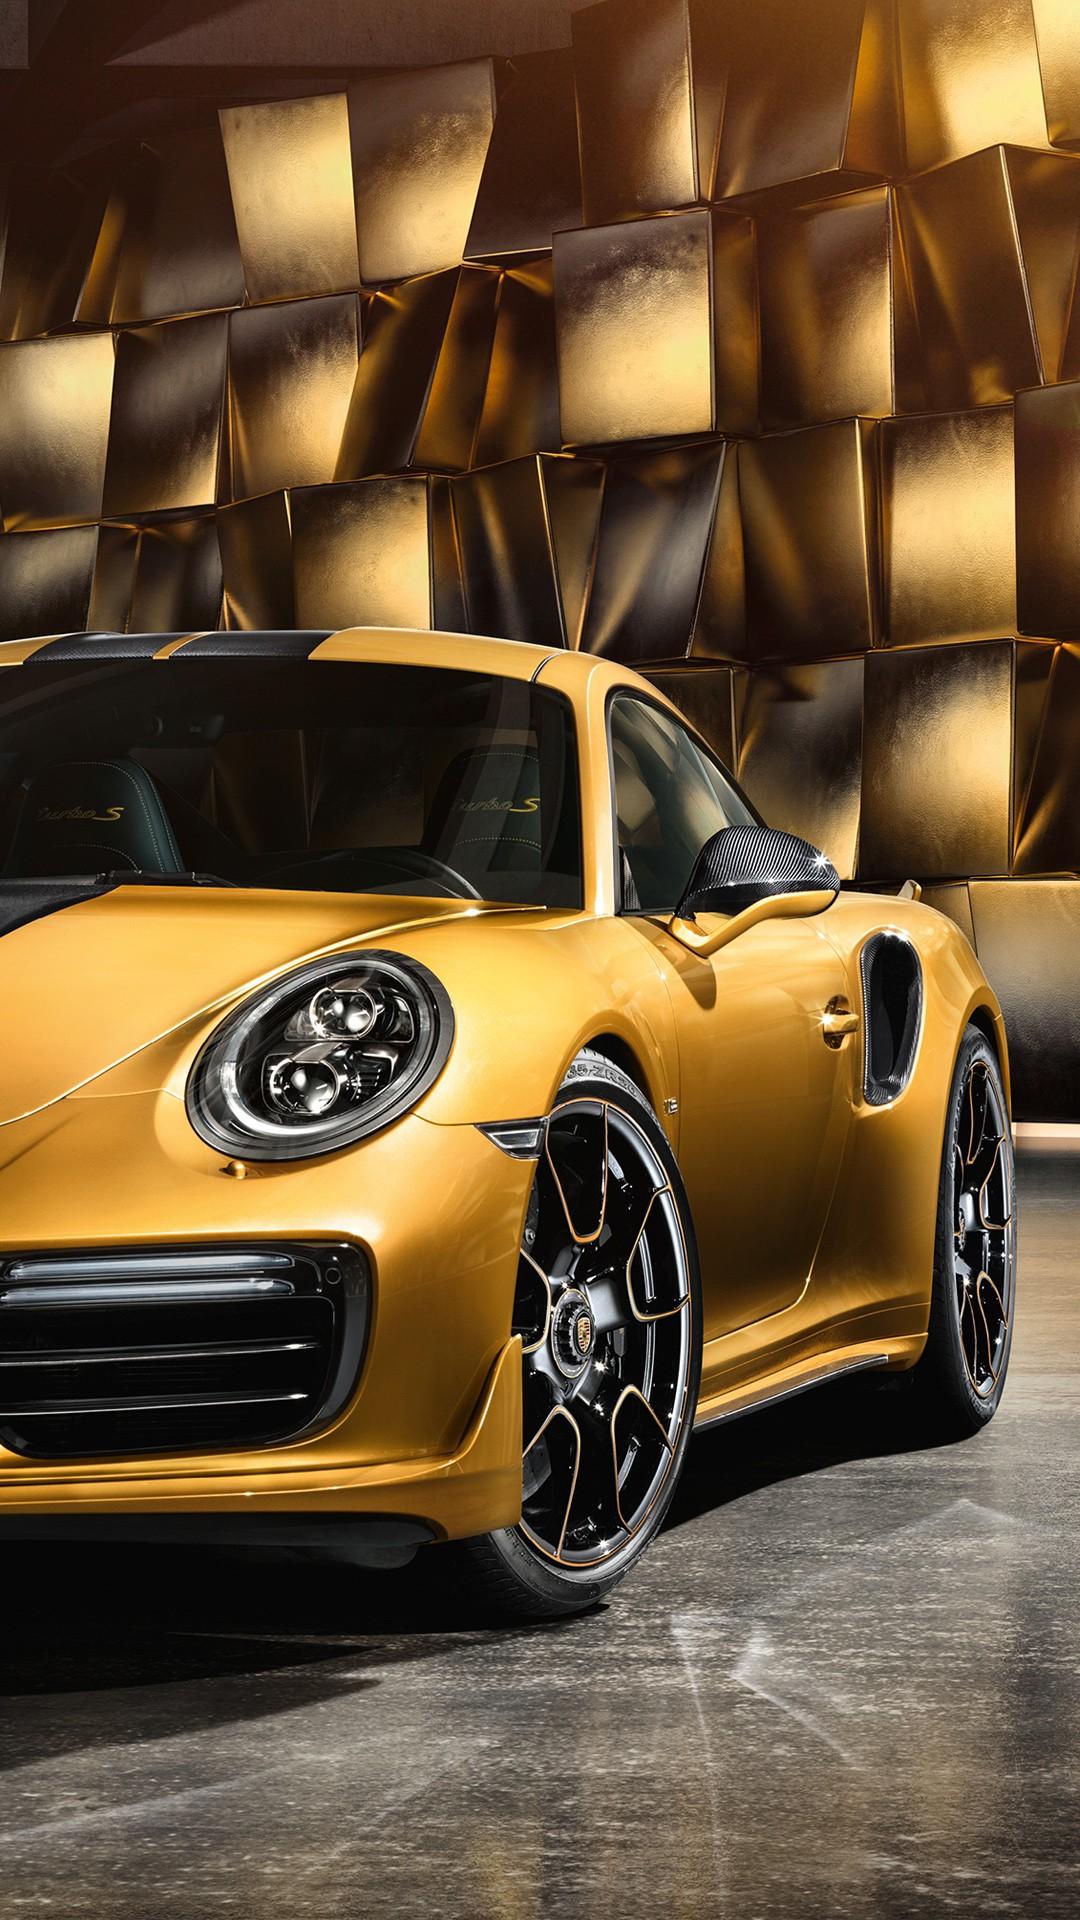 Gold Iphone X Wallpaper 2017 Porsche 911 Turbo S Exclusive Series Wallpapers Hd